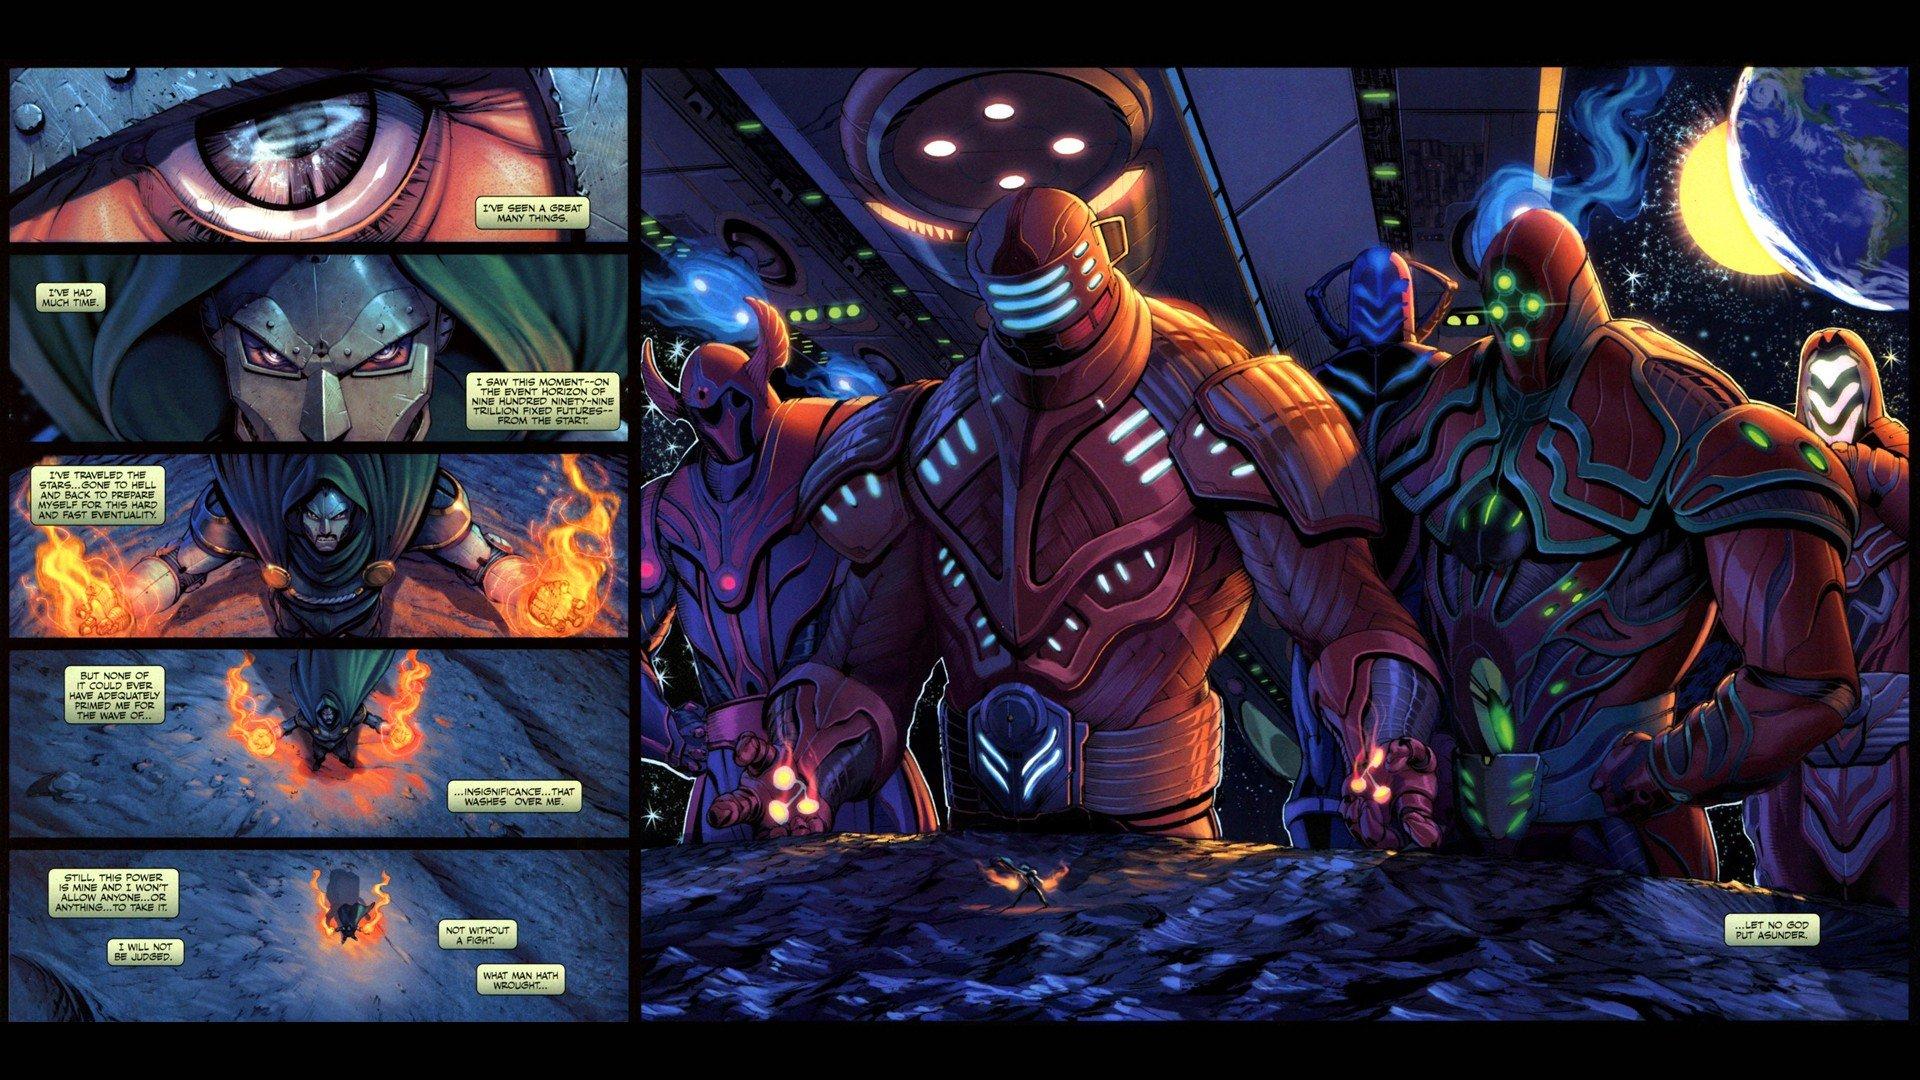 Best Wallpaper Marvel Secret Wars - 3ab  Perfect Image Reference_597236.jpg